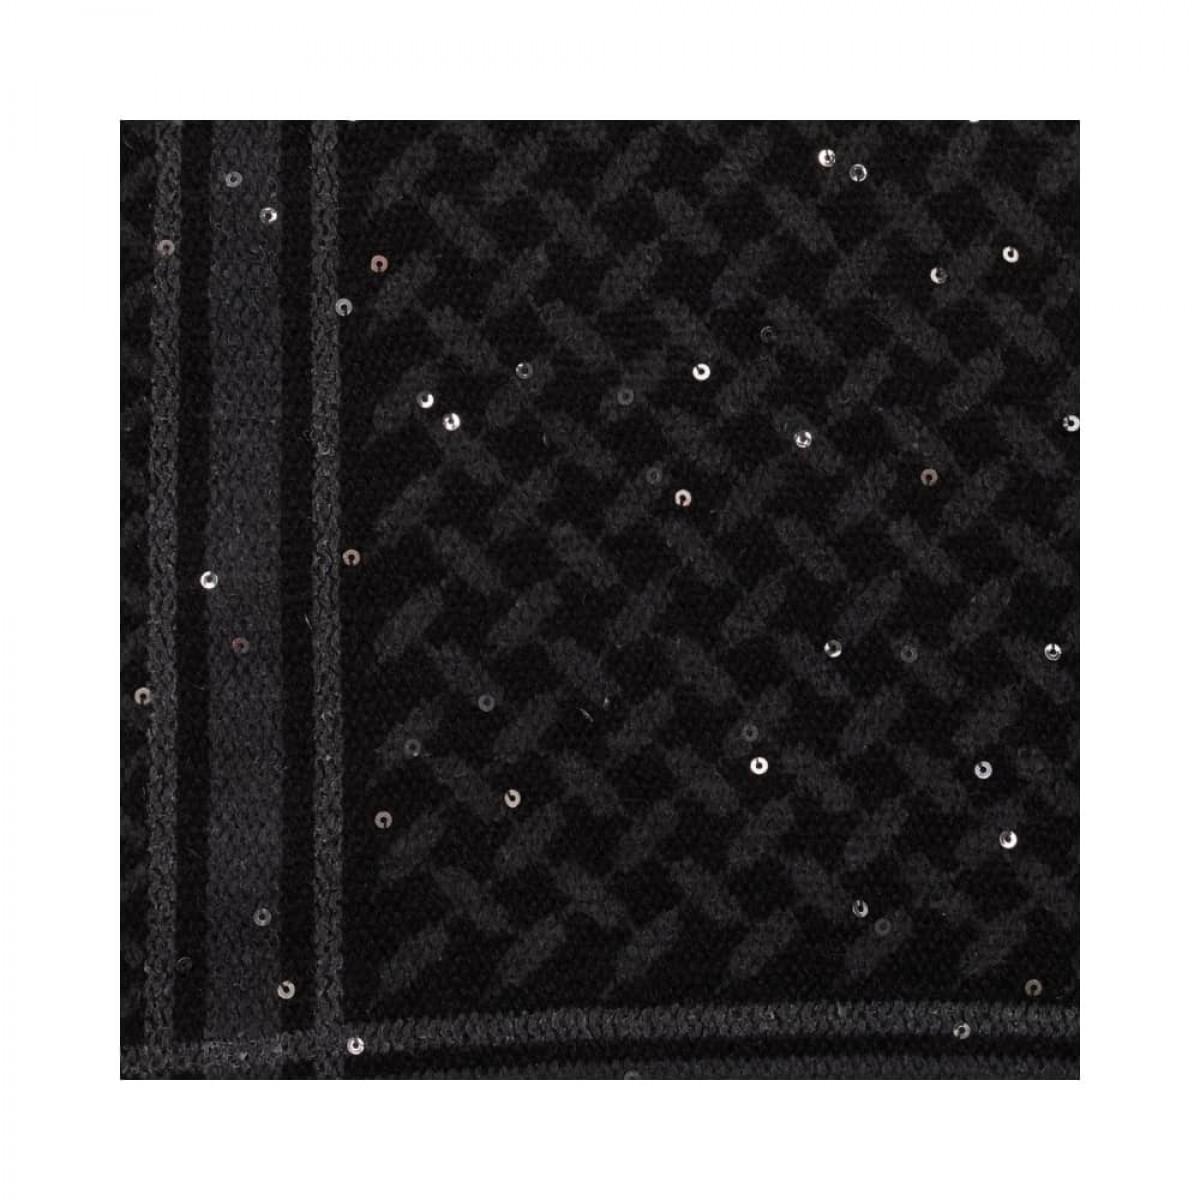 triangle trinity classic m - sequins black - detalje